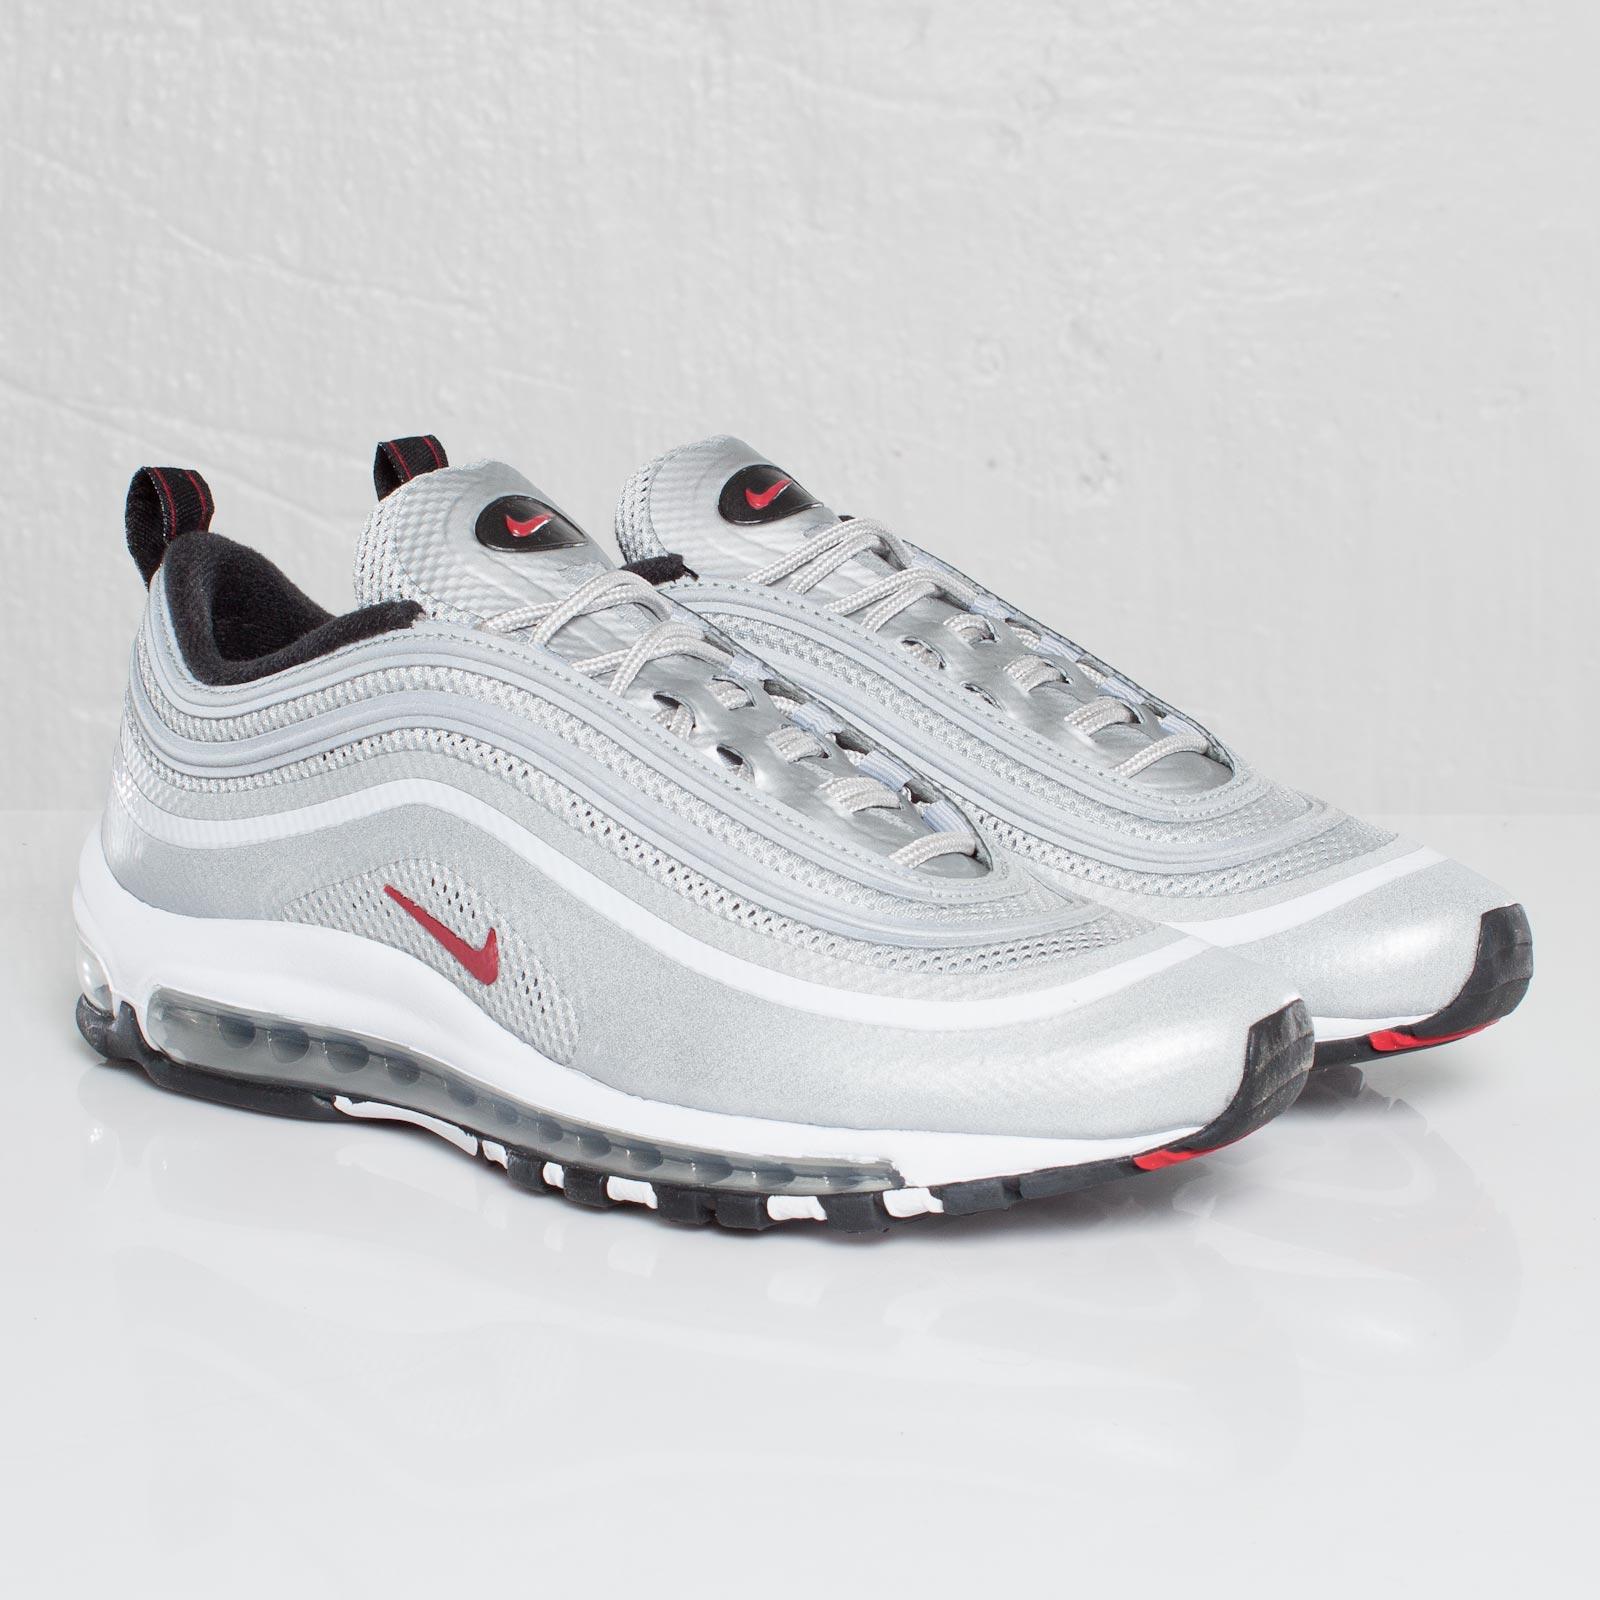 192ac7277ef Nike Air Max 97 Premium NRG - 542427-060 - Sneakersnstuff